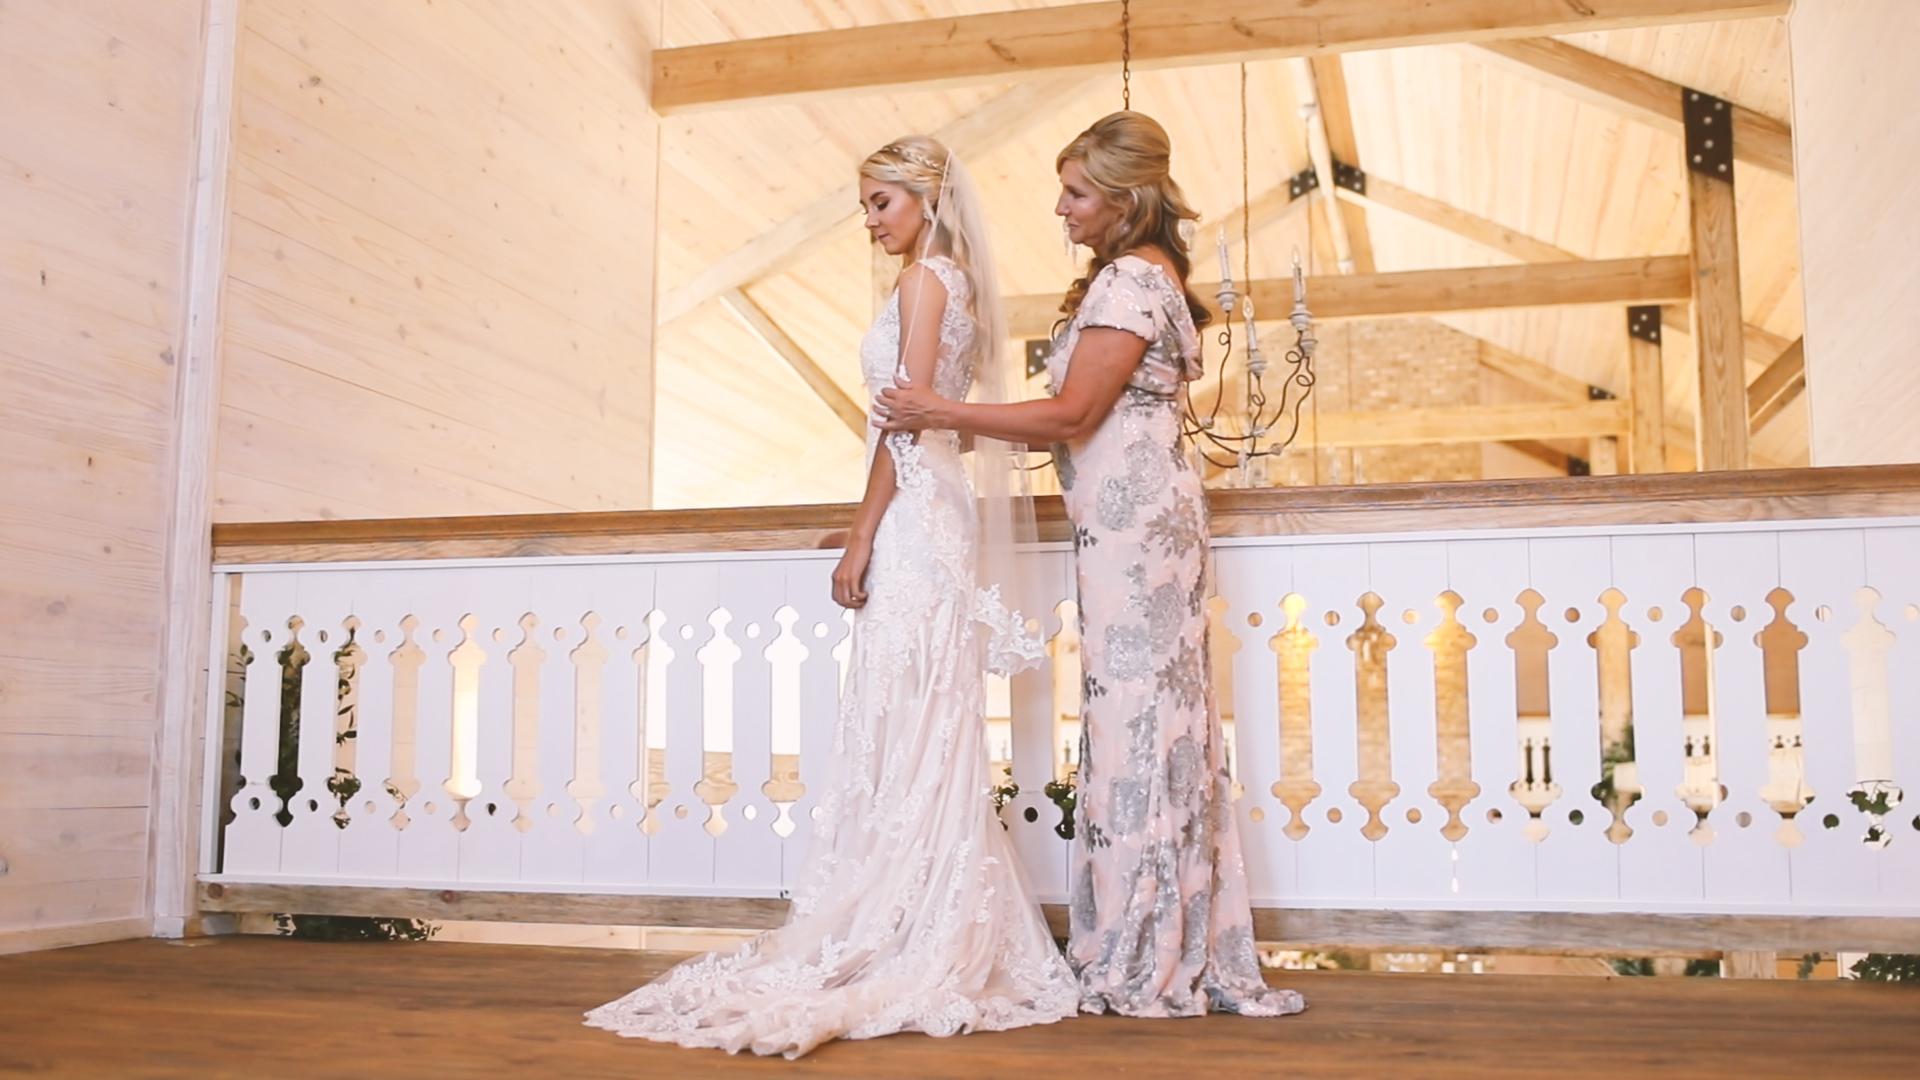 Mother Daughter Wedding - Bride Film